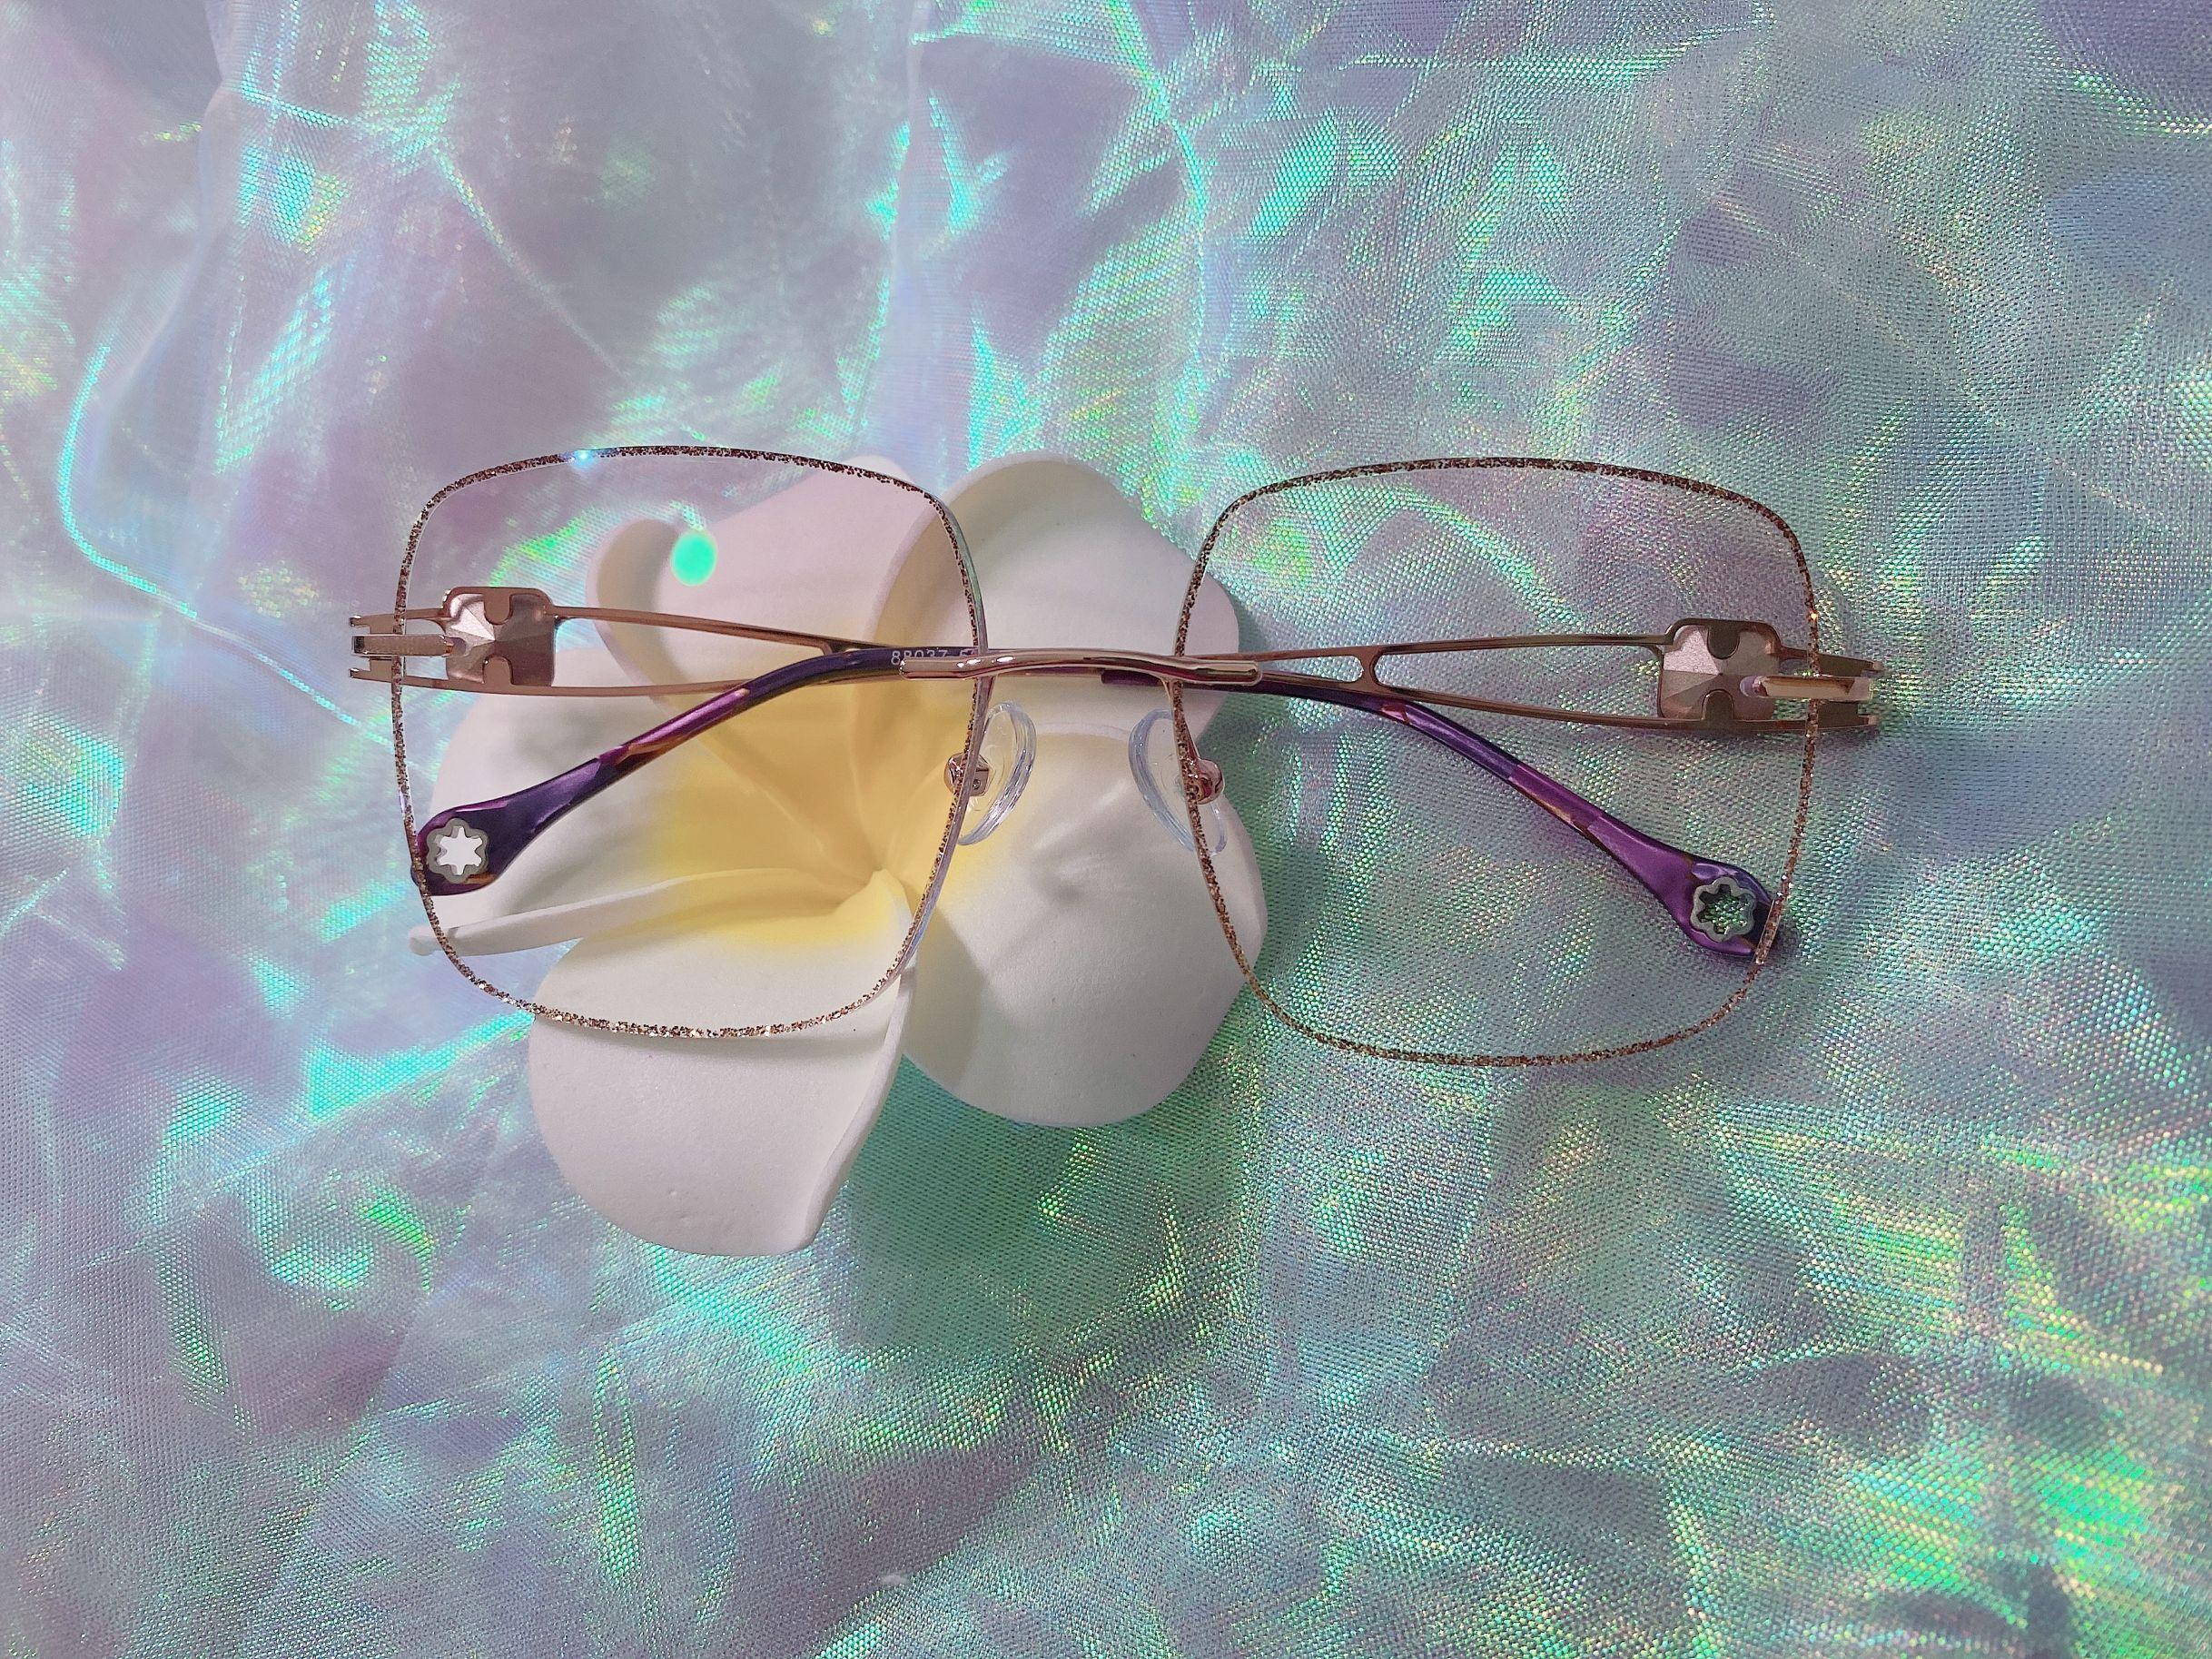 Short sighted glasses, female gemstone legs, diamond rimless glasses, plain face, large face, glasses frame, finished glasses